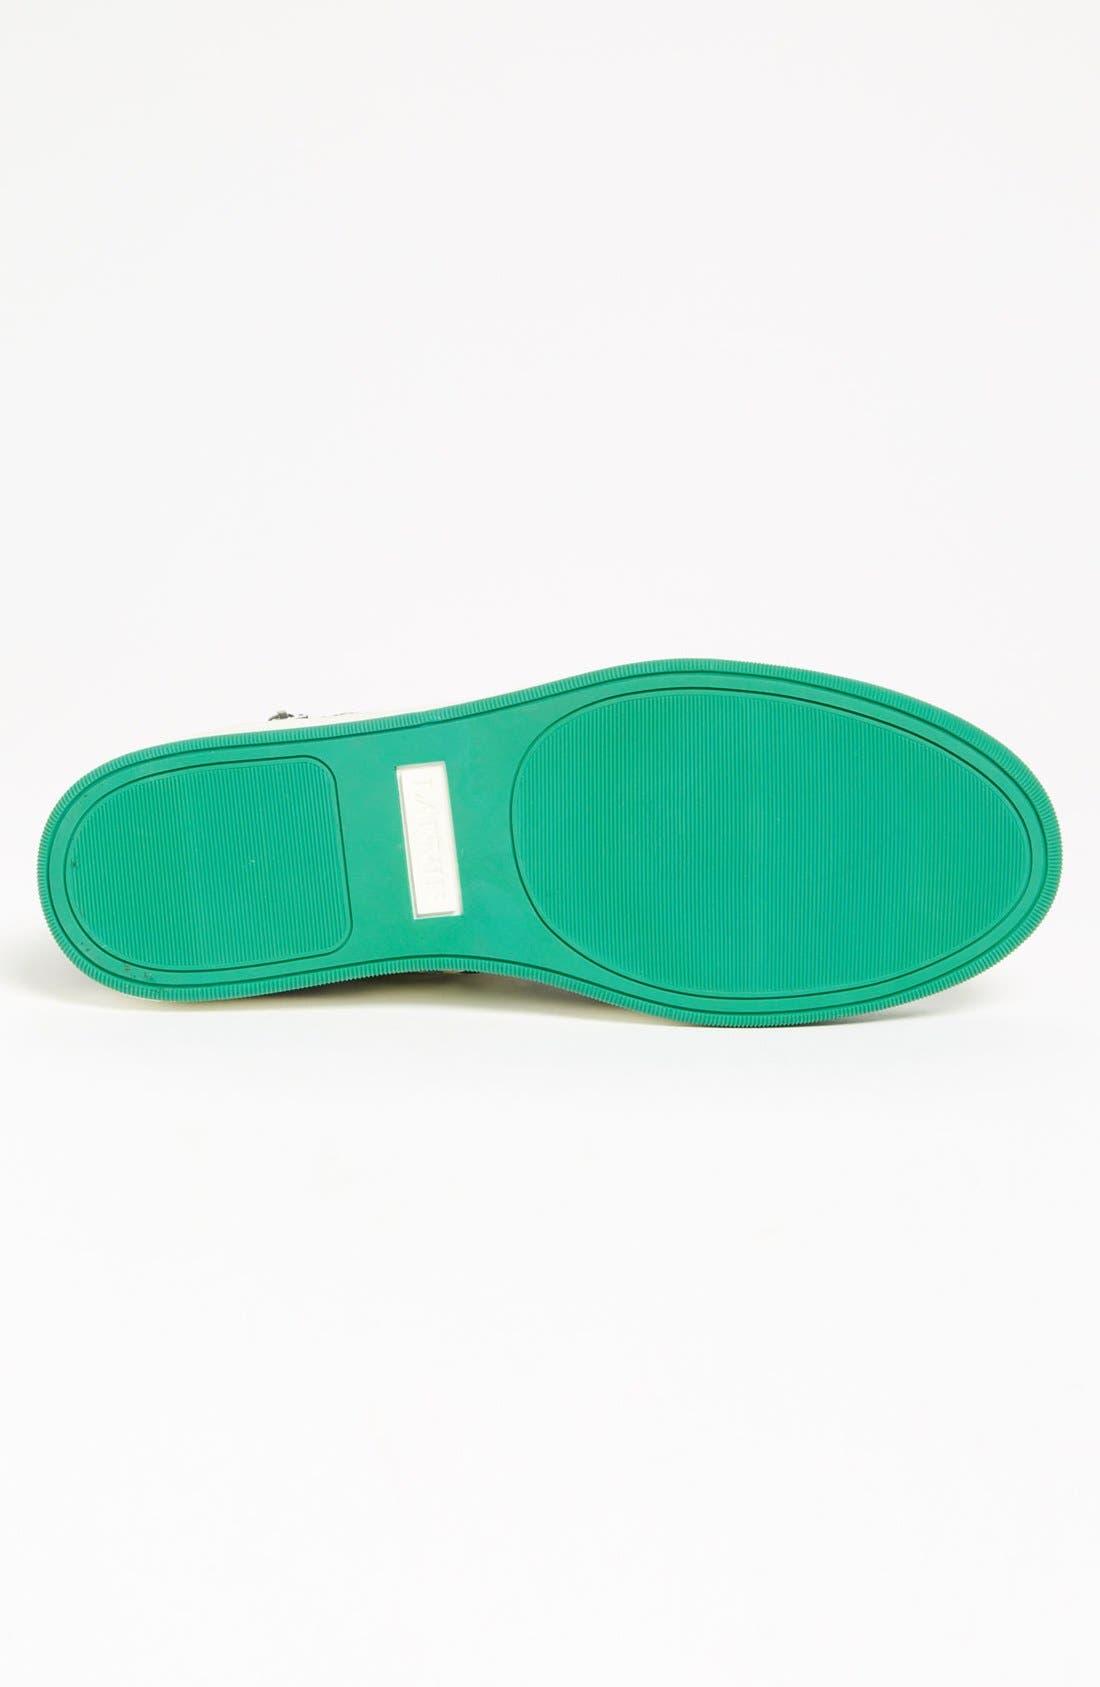 High Top Sneaker,                             Alternate thumbnail 4, color,                             300